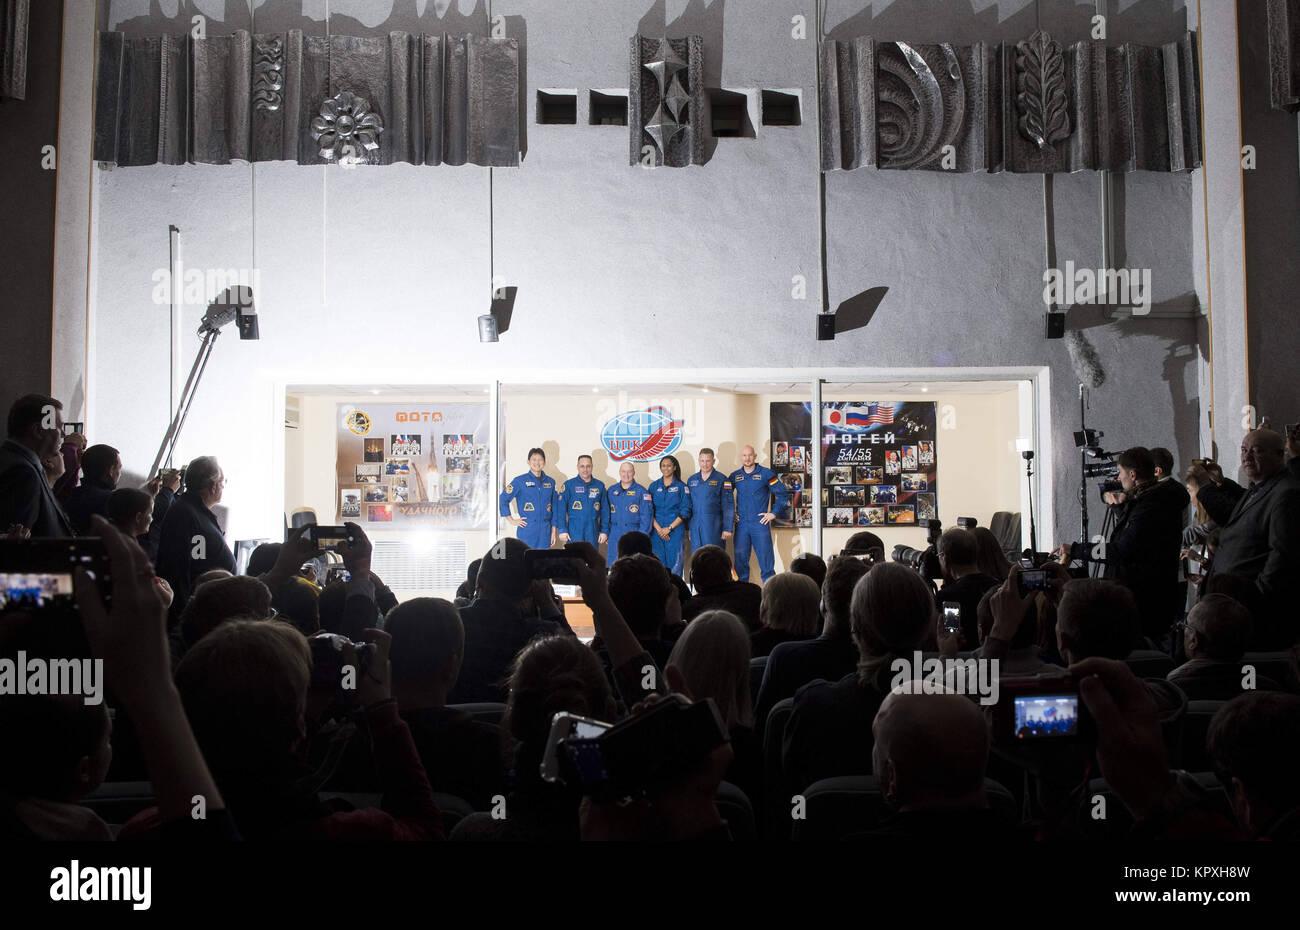 Baikonur, Kazakhstan. 16th Dec, 2017. Expedition 54 prime crew members flight engineer Norishige Kanai of Japan - Stock Image